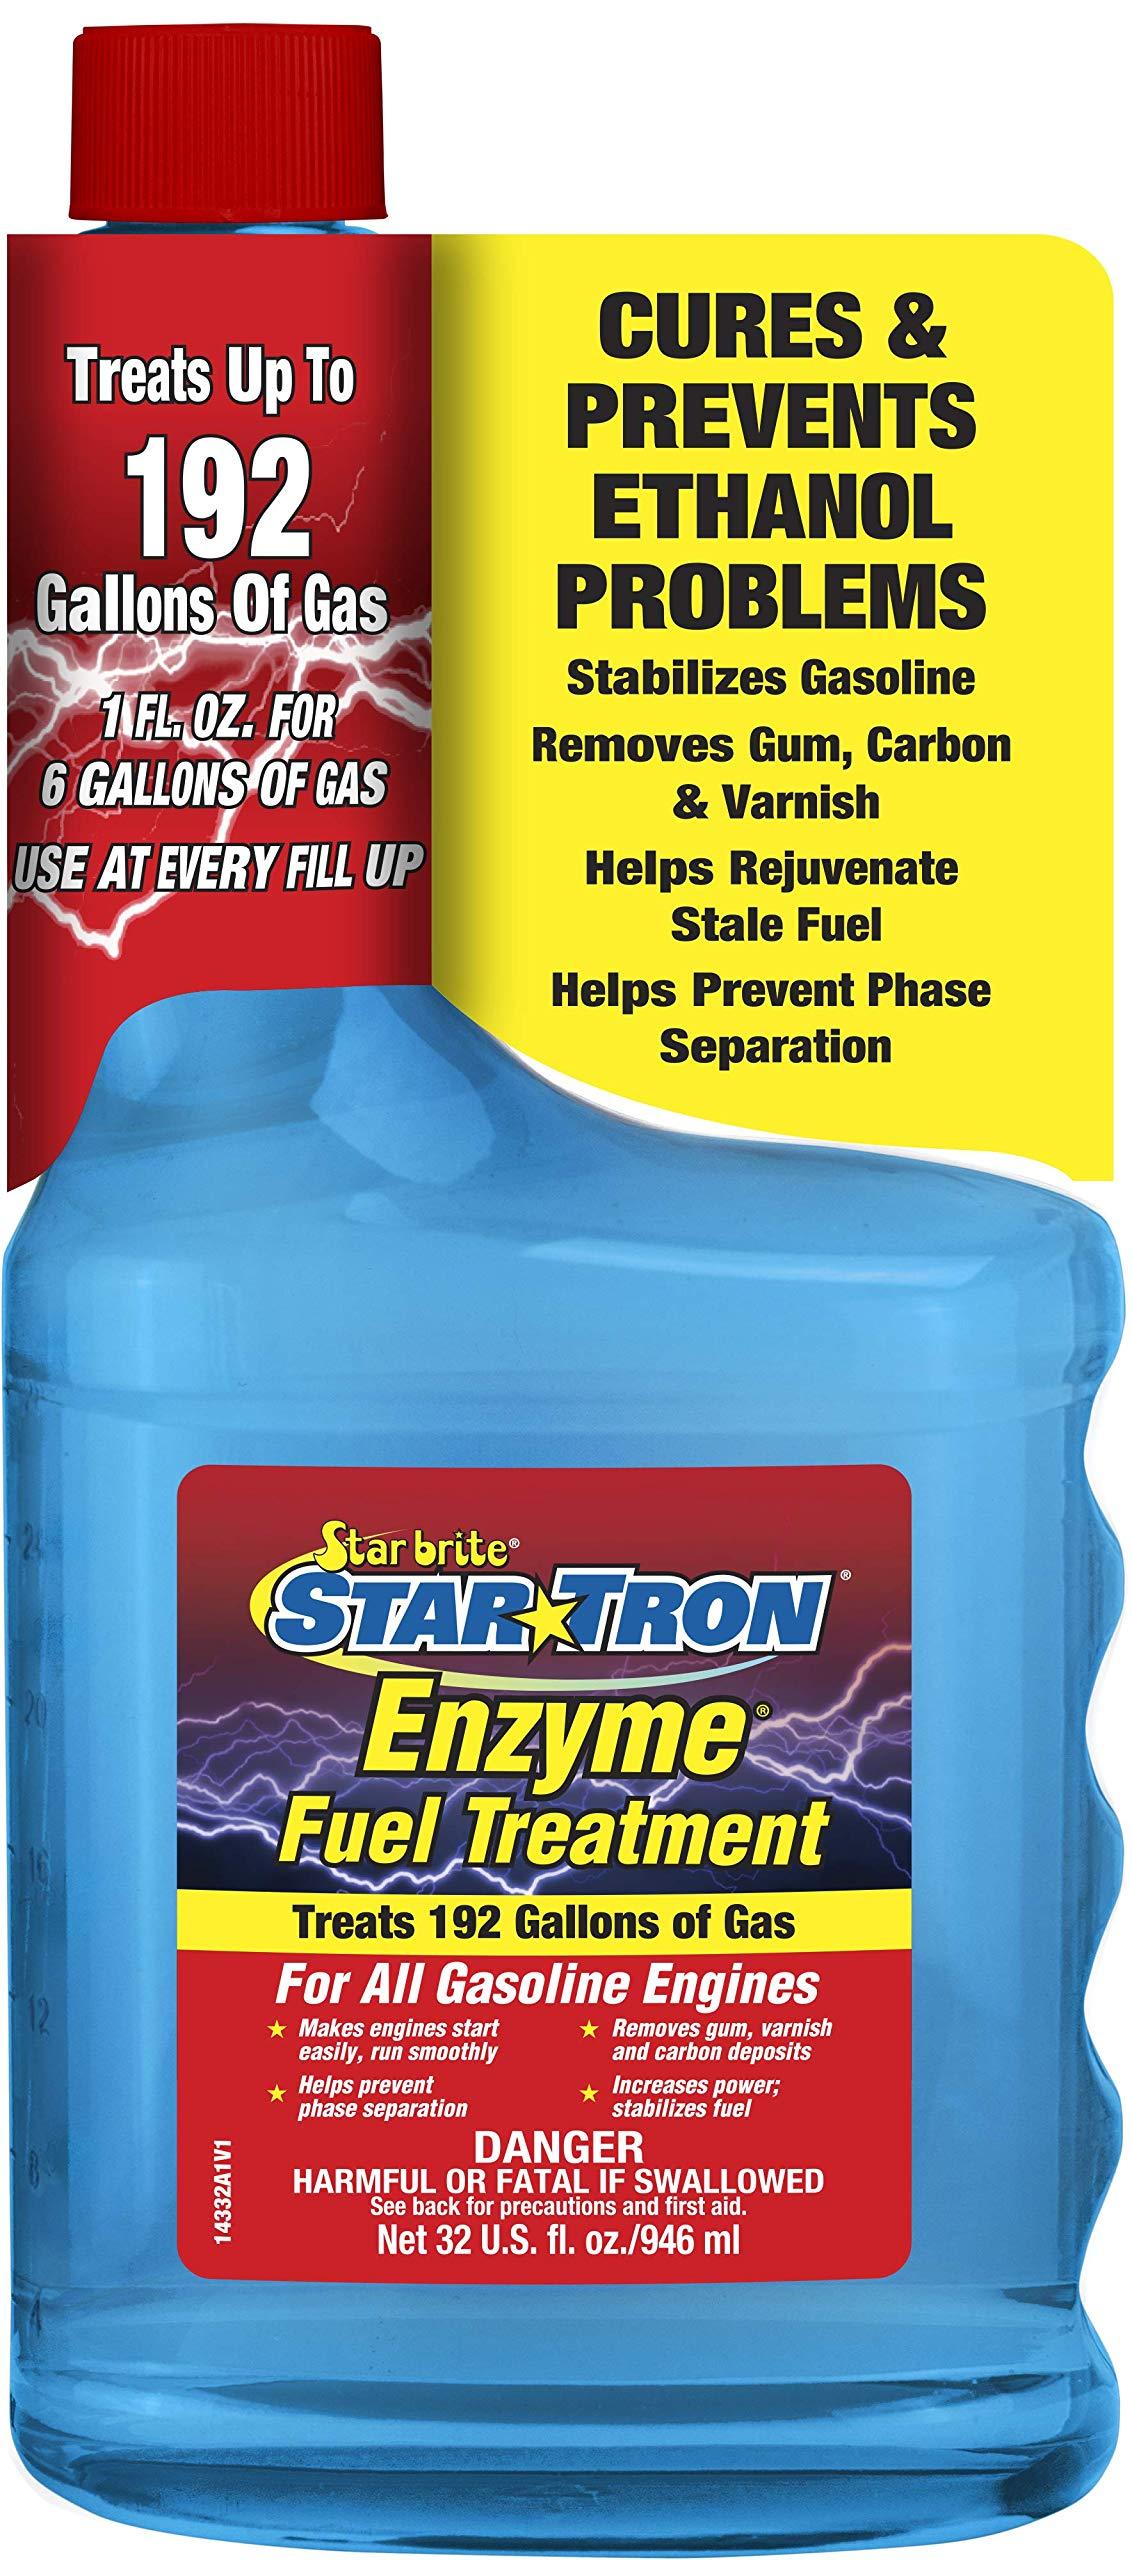 Star brite 14332 Star Tron Enzyme Fuel Treatment - Classic Gas Formula 143-32 Oz. Treats 192 Gallon,